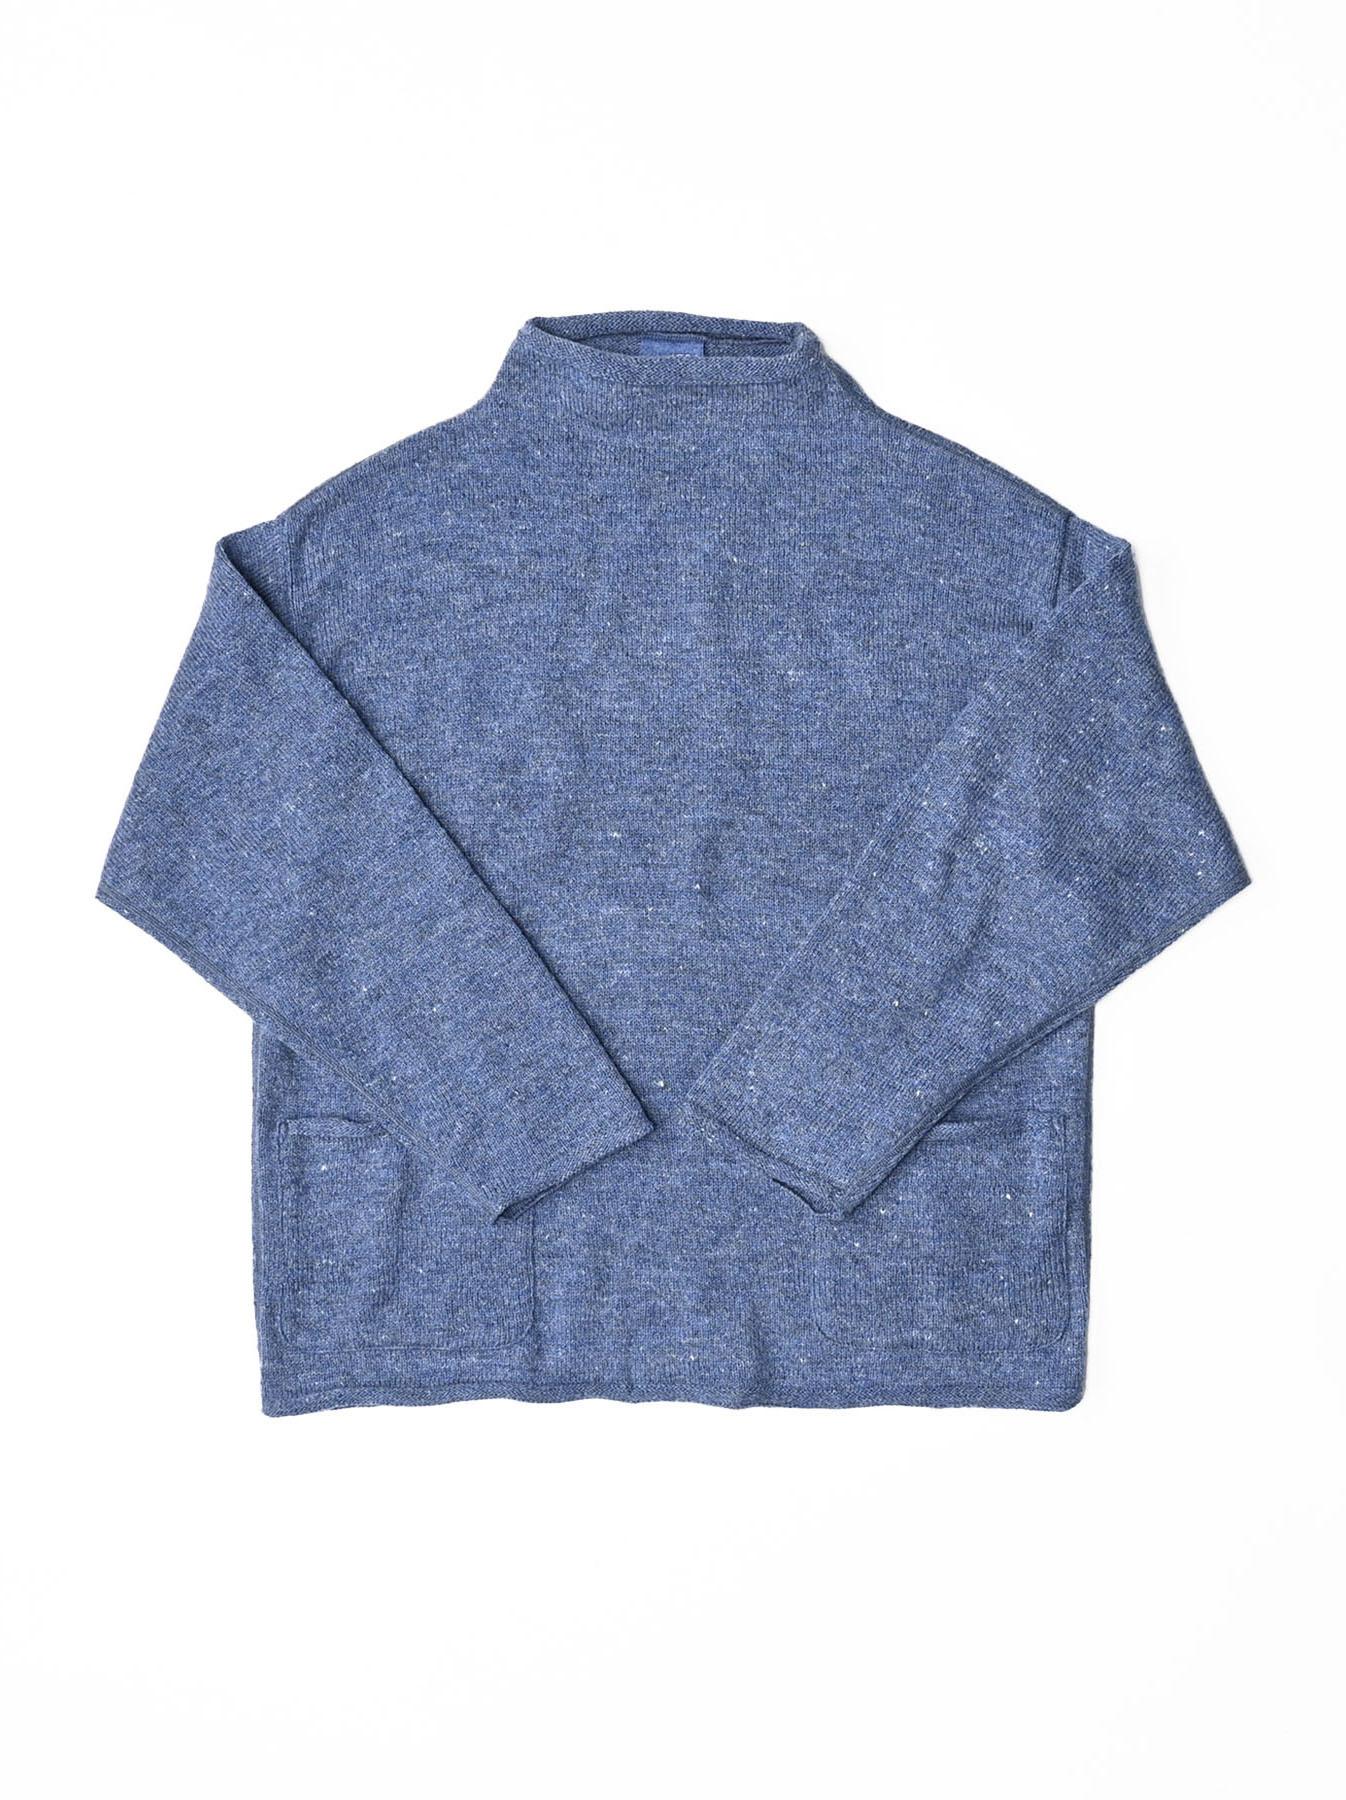 Cotton Shetland Knit-sew Mockneck Sweater-4